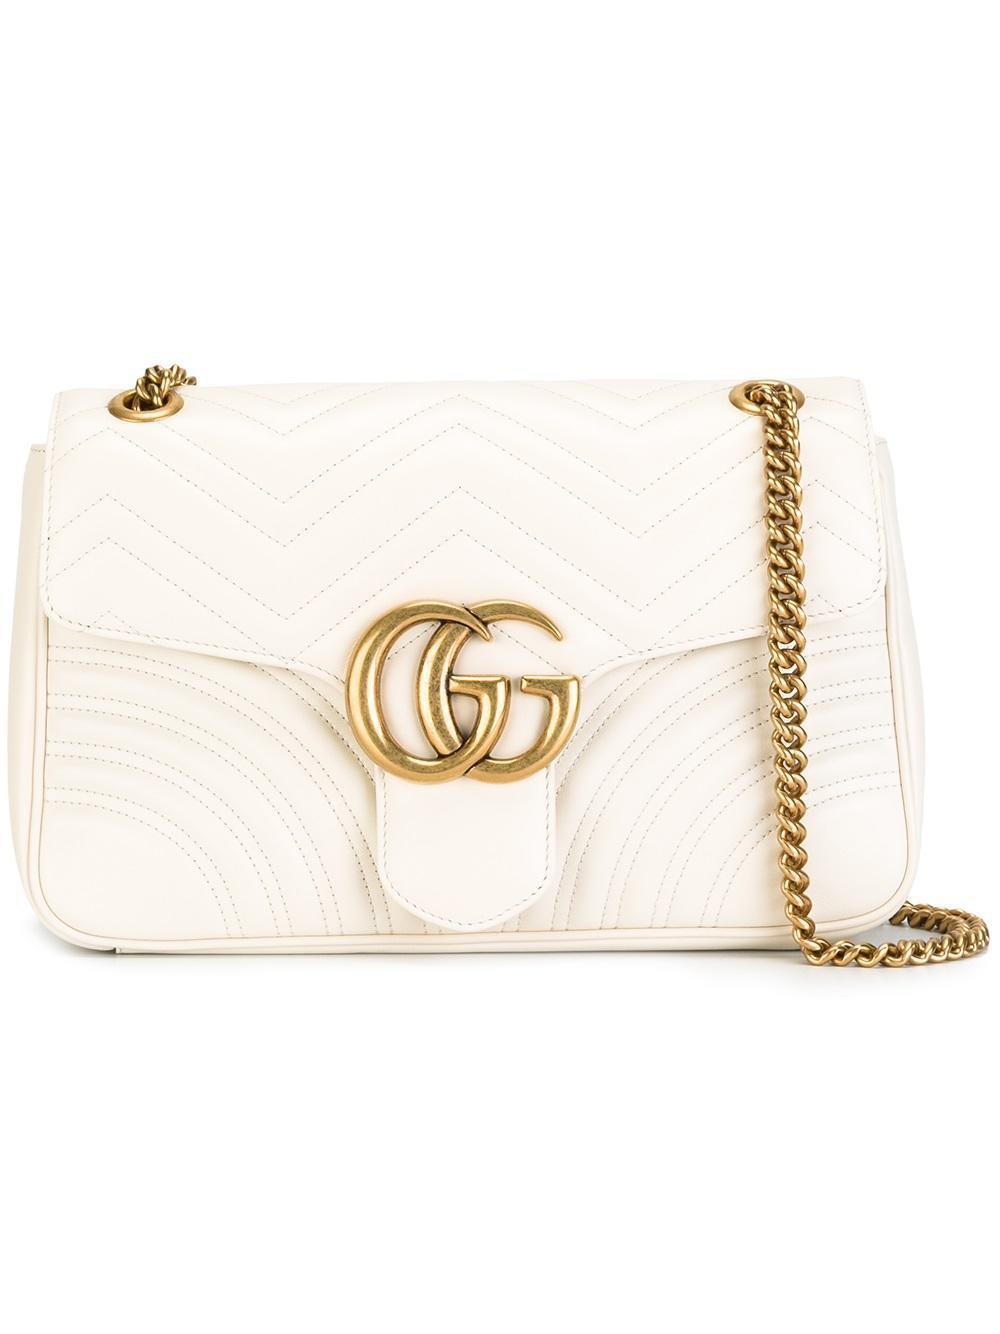 9fbda8d38b71 Gucci Gg Marmont Matelassé Shoulder Bag in White - Lyst